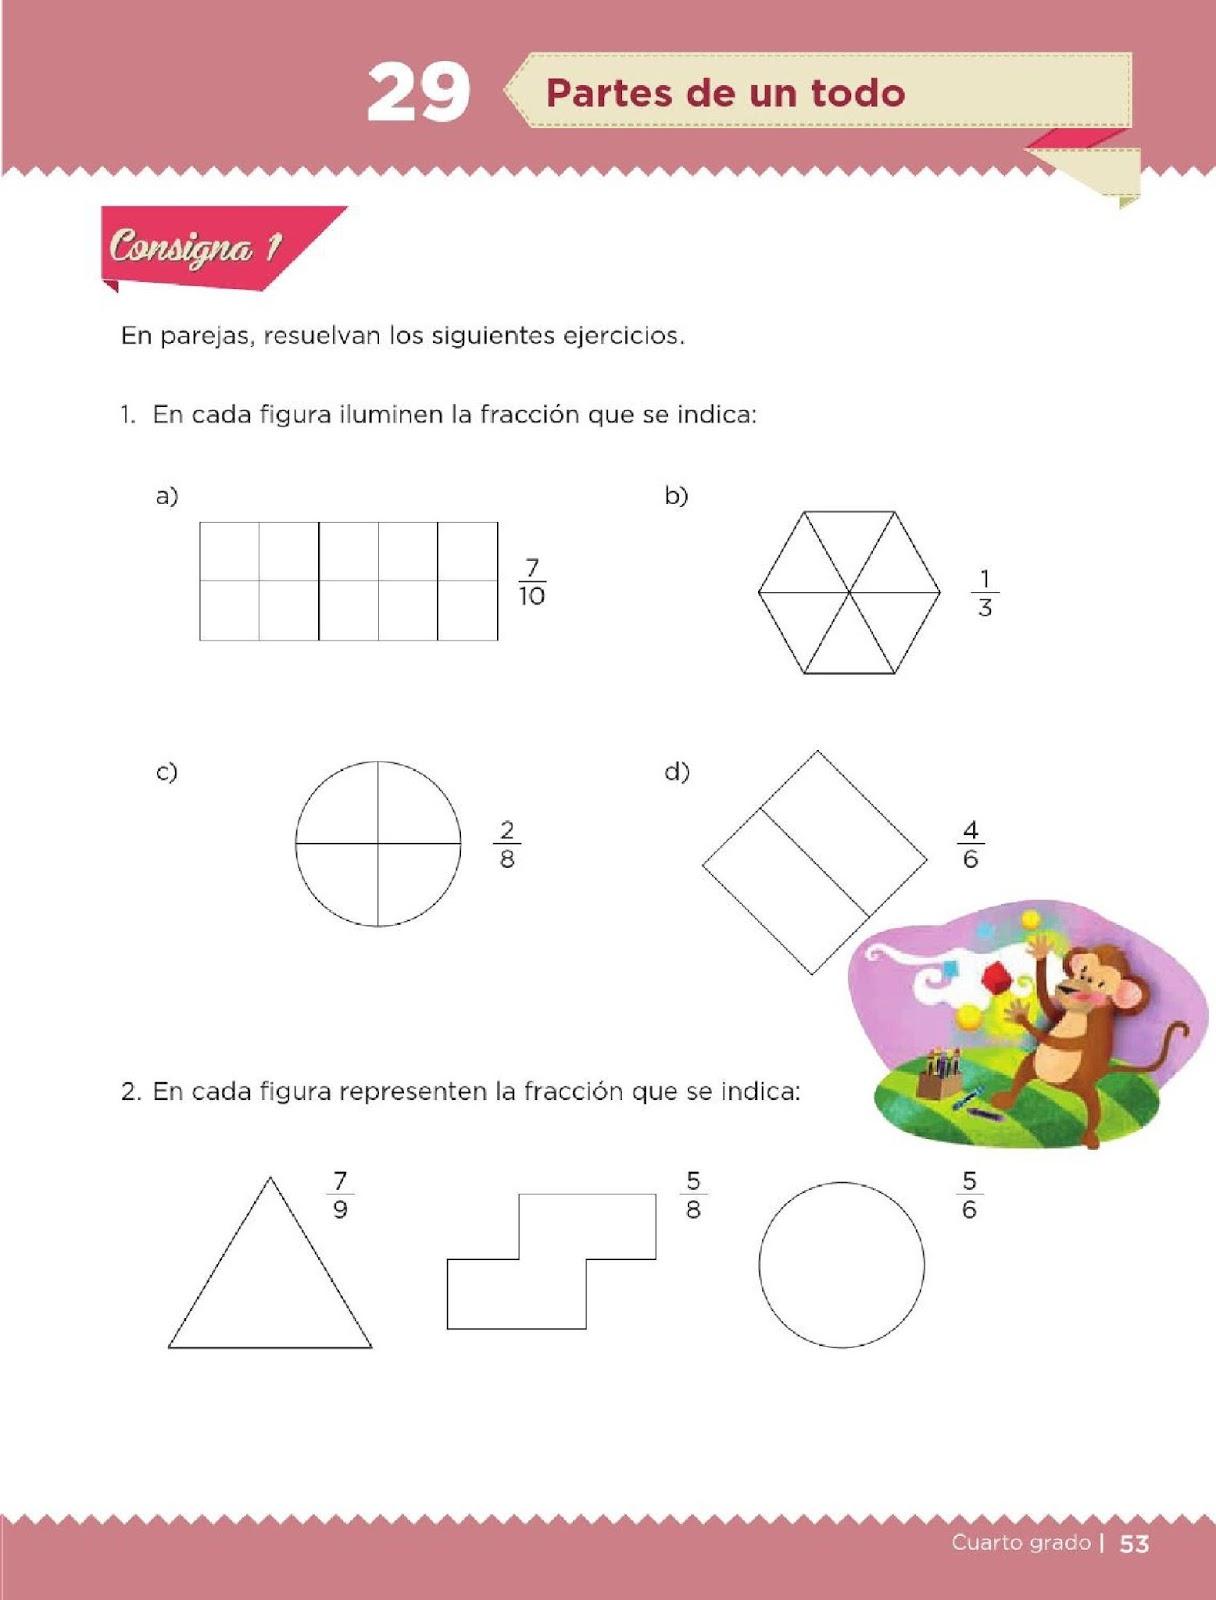 ... Matemáticos 4to. Grado Bloque II Lección 29 Partes de un todo